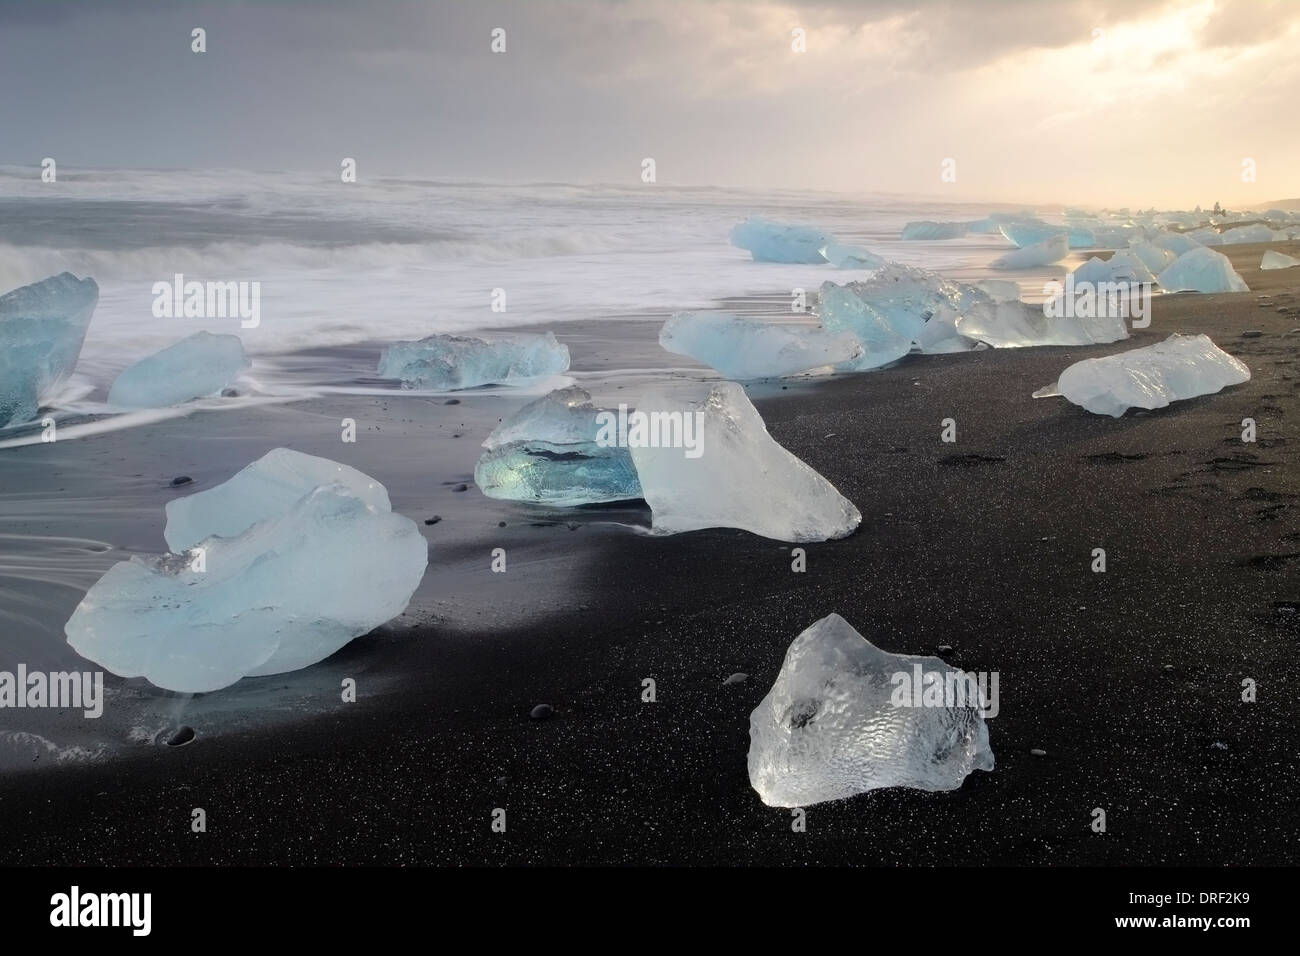 Icebergs on volcanic sands, Jokulsarlon, Iceland, Polar region - Stock Image